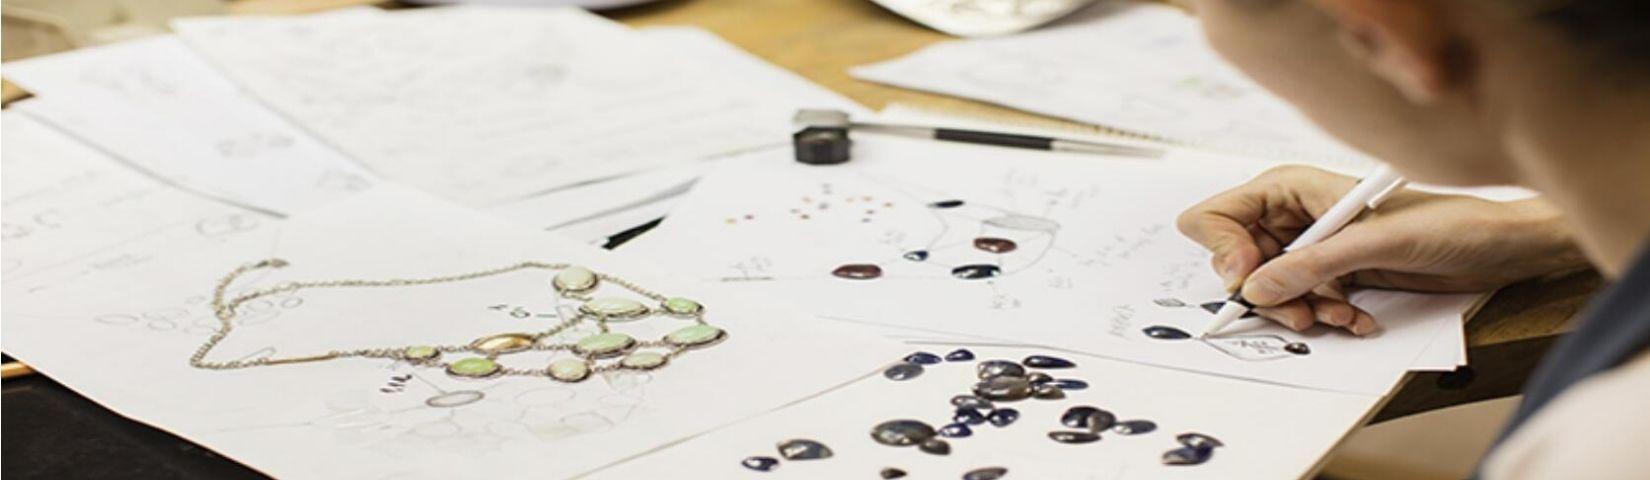 Jewelry Design by TALMUD